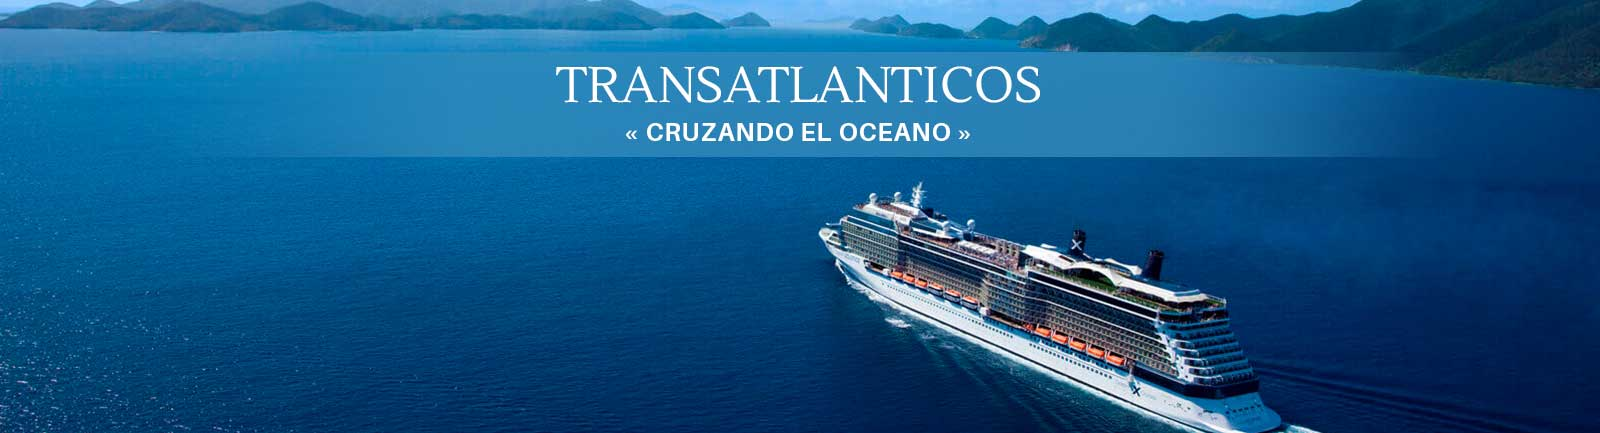 Crucero Transatlánticos